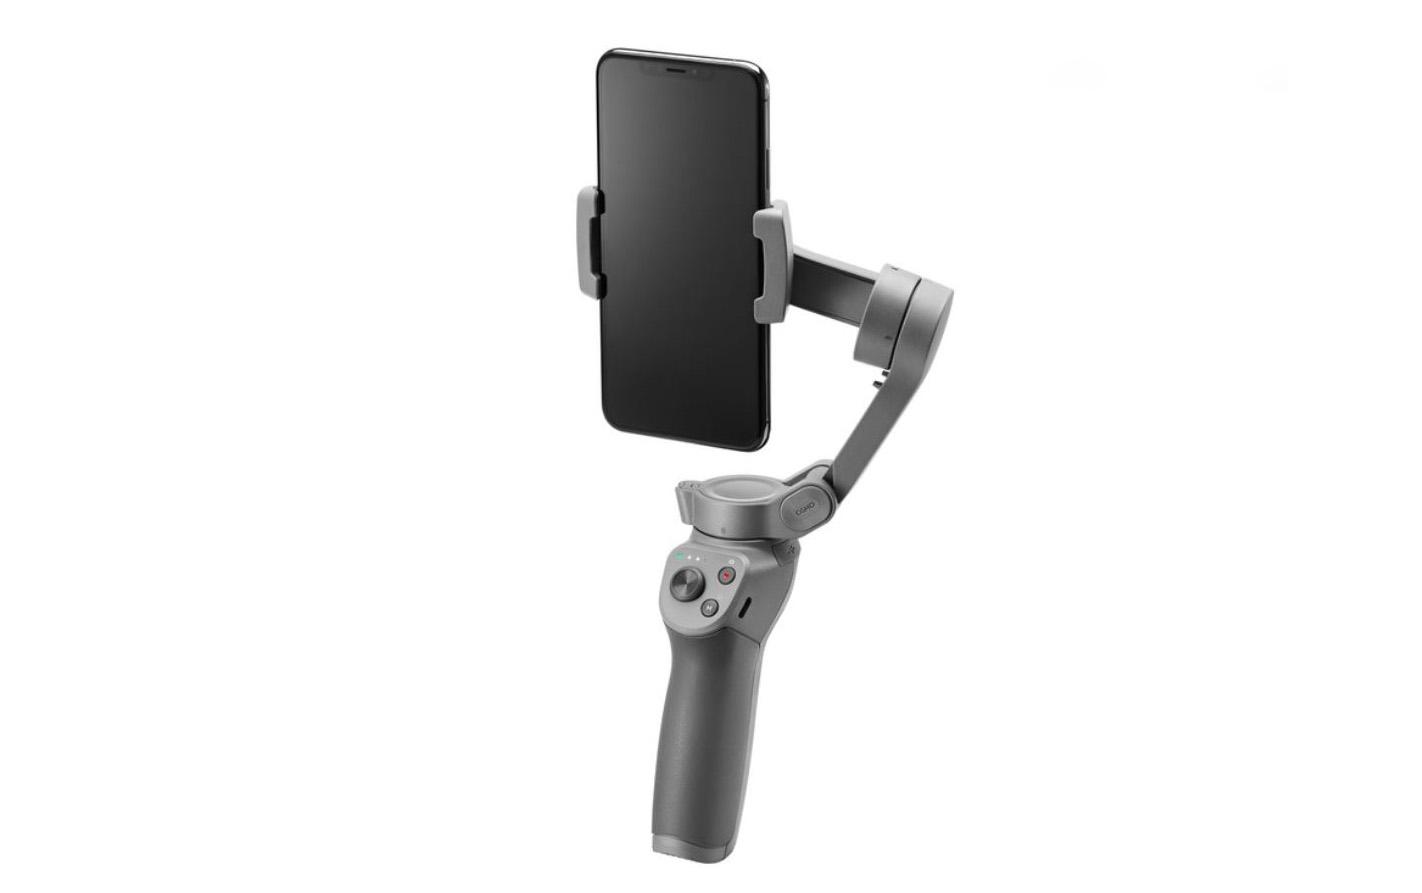 DJI Osmo Mobile 3 : portrait.